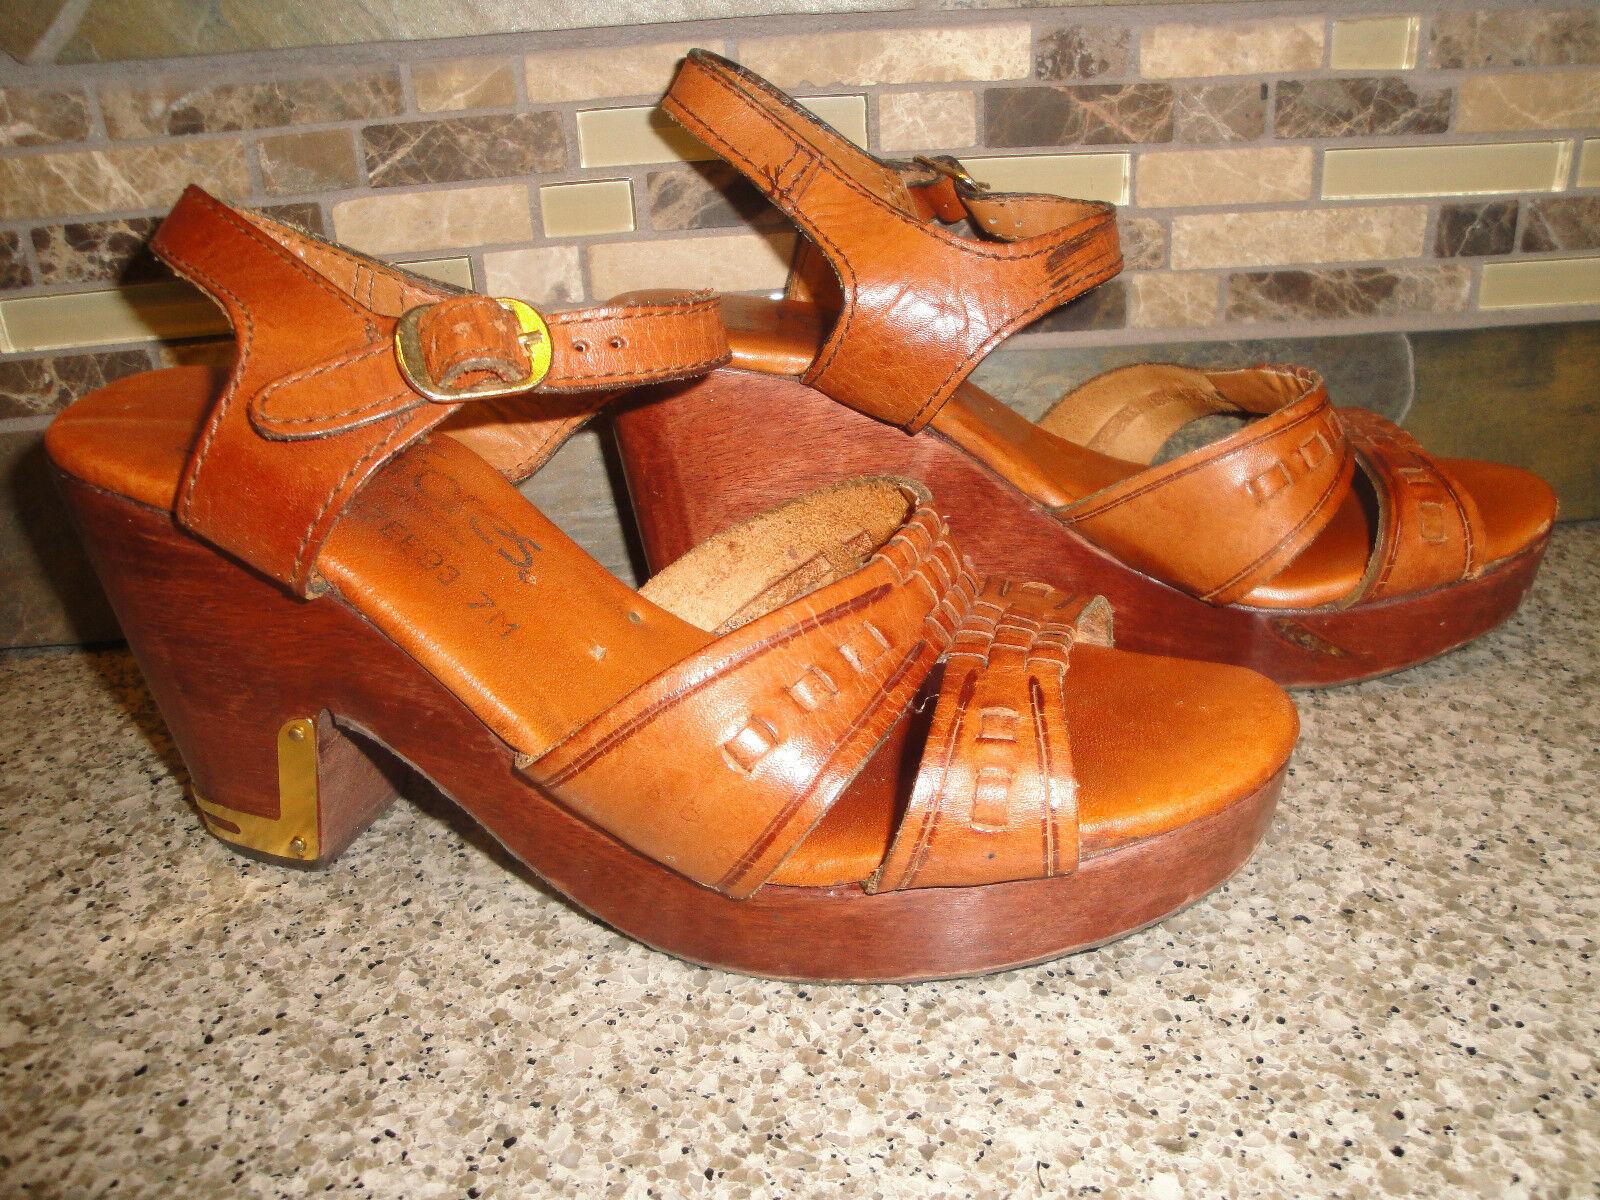 Vintage FANFARES Damenschuhe Sz 7M Brazil Braun Leder Schuhes Wood 3.5